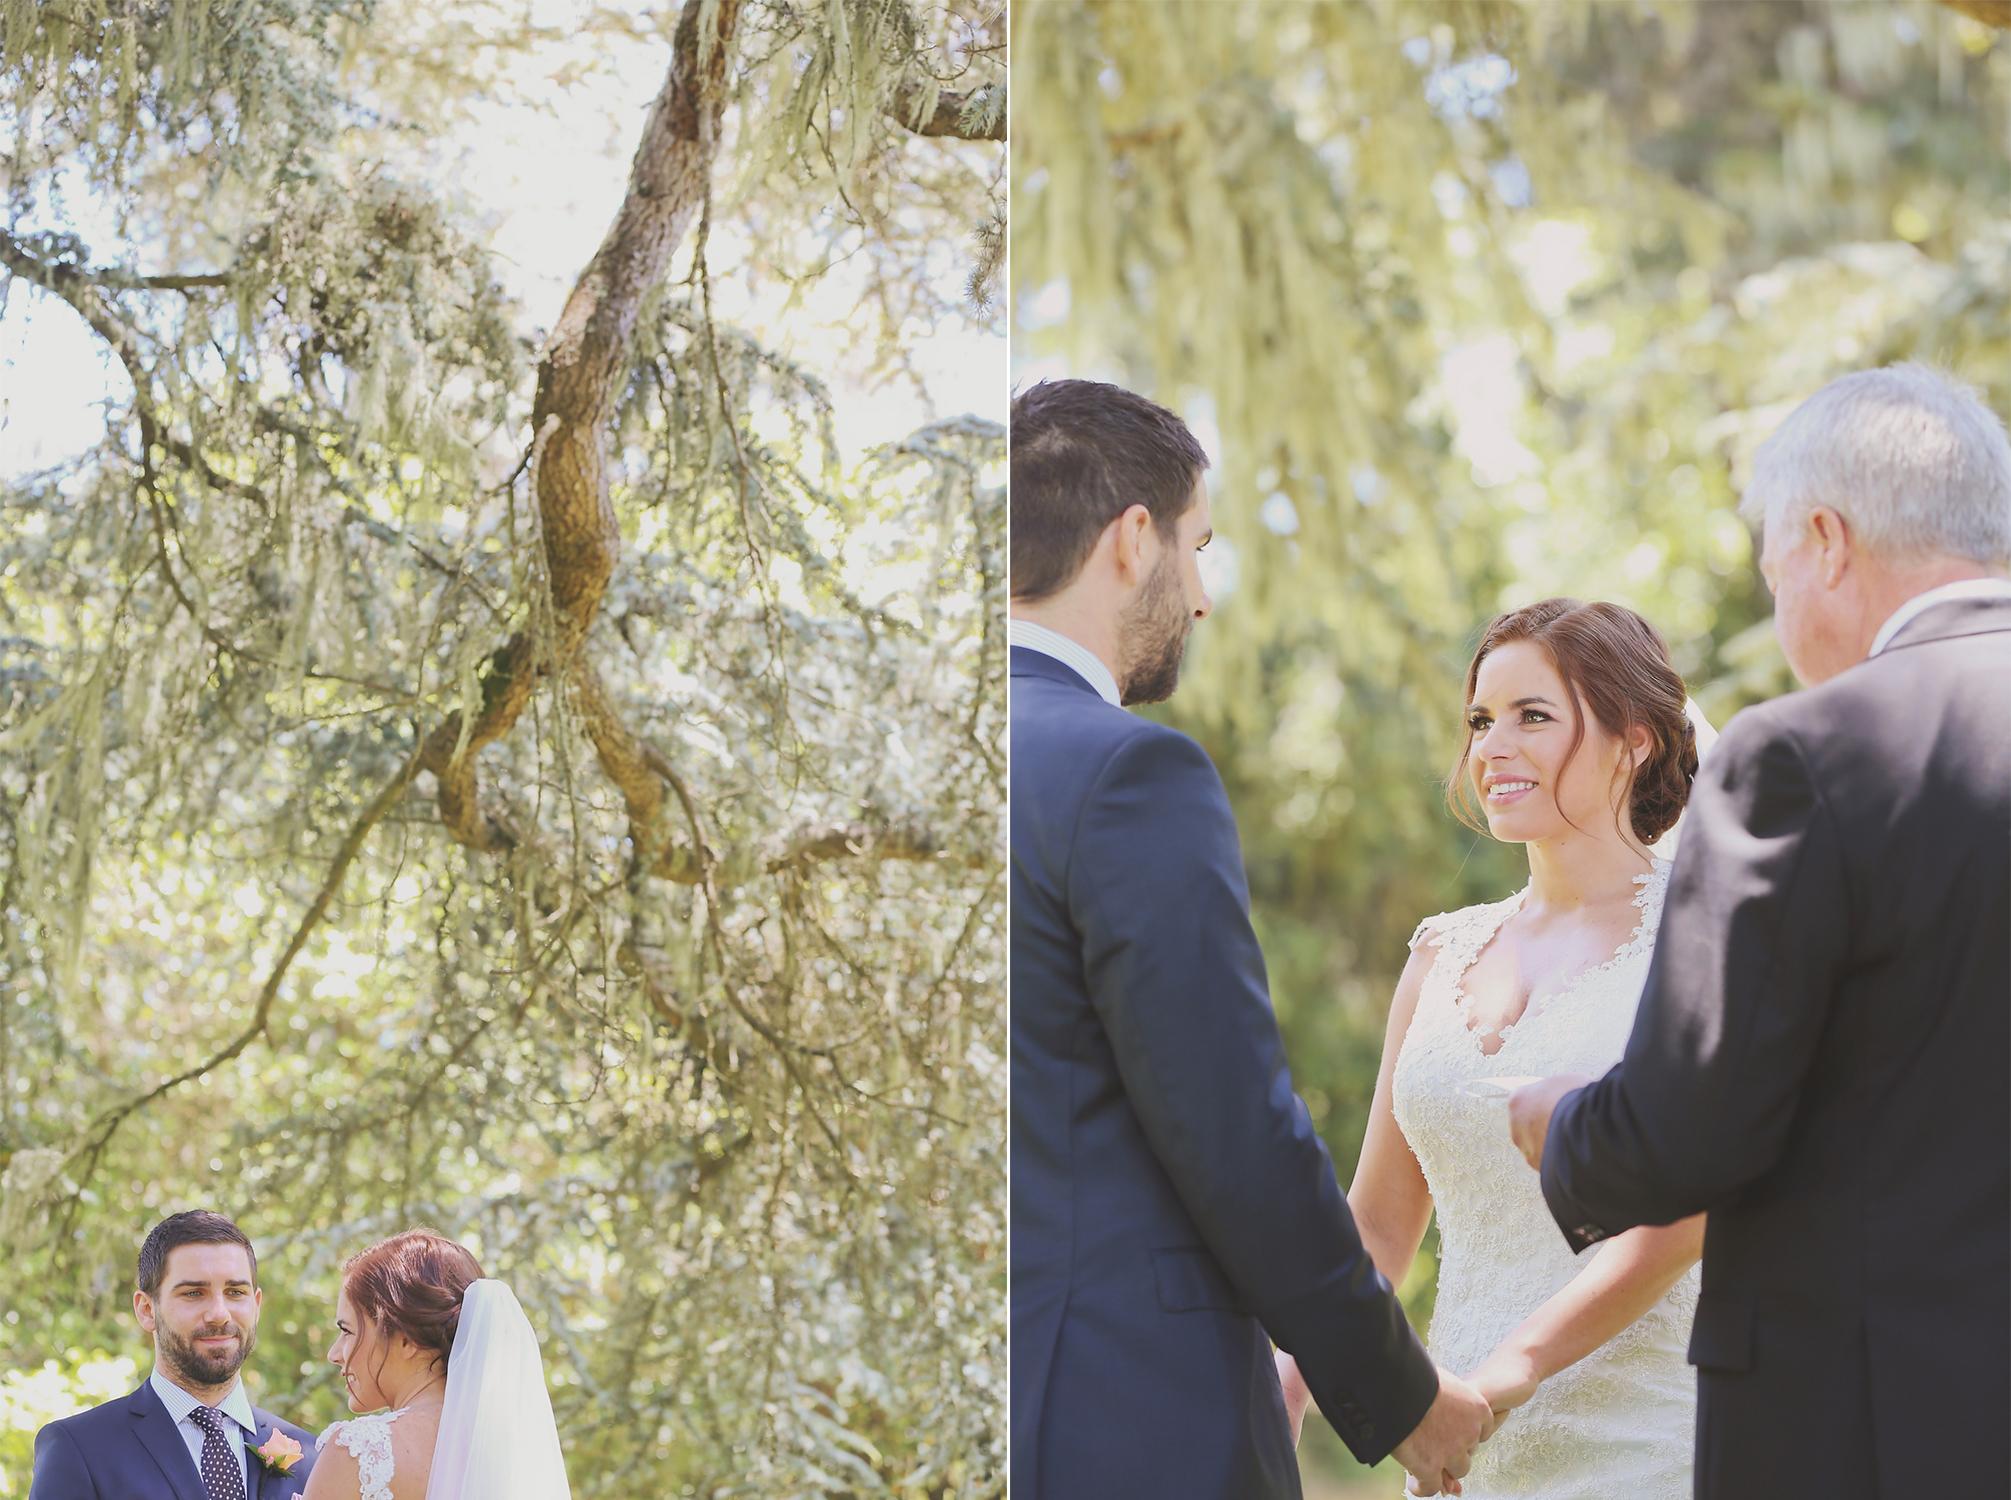 wellington wedding photography NZ - 0230.JPG